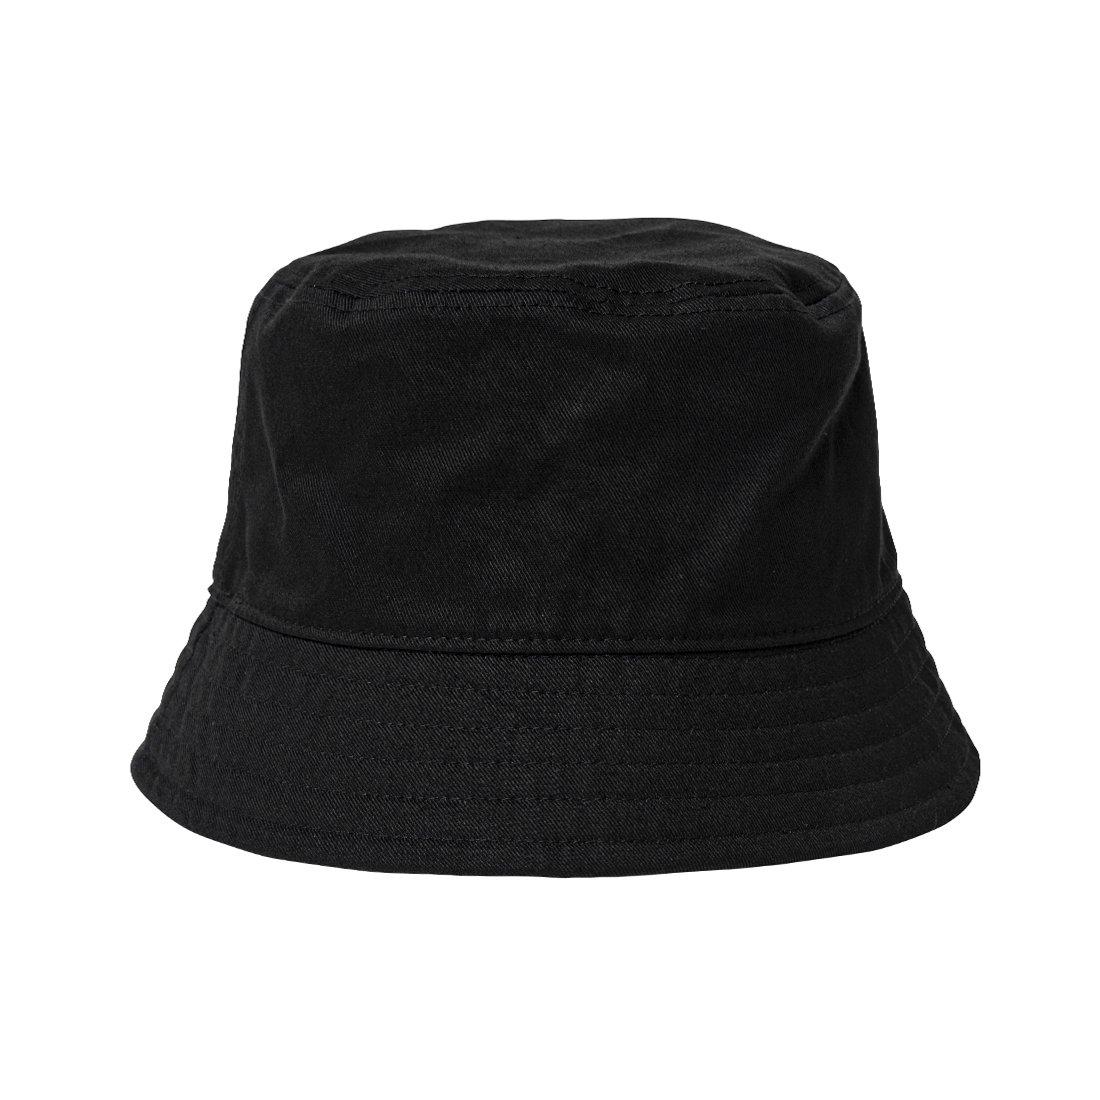 KLON BUCKET HAT SERIAL NUMBER LINE BLACK